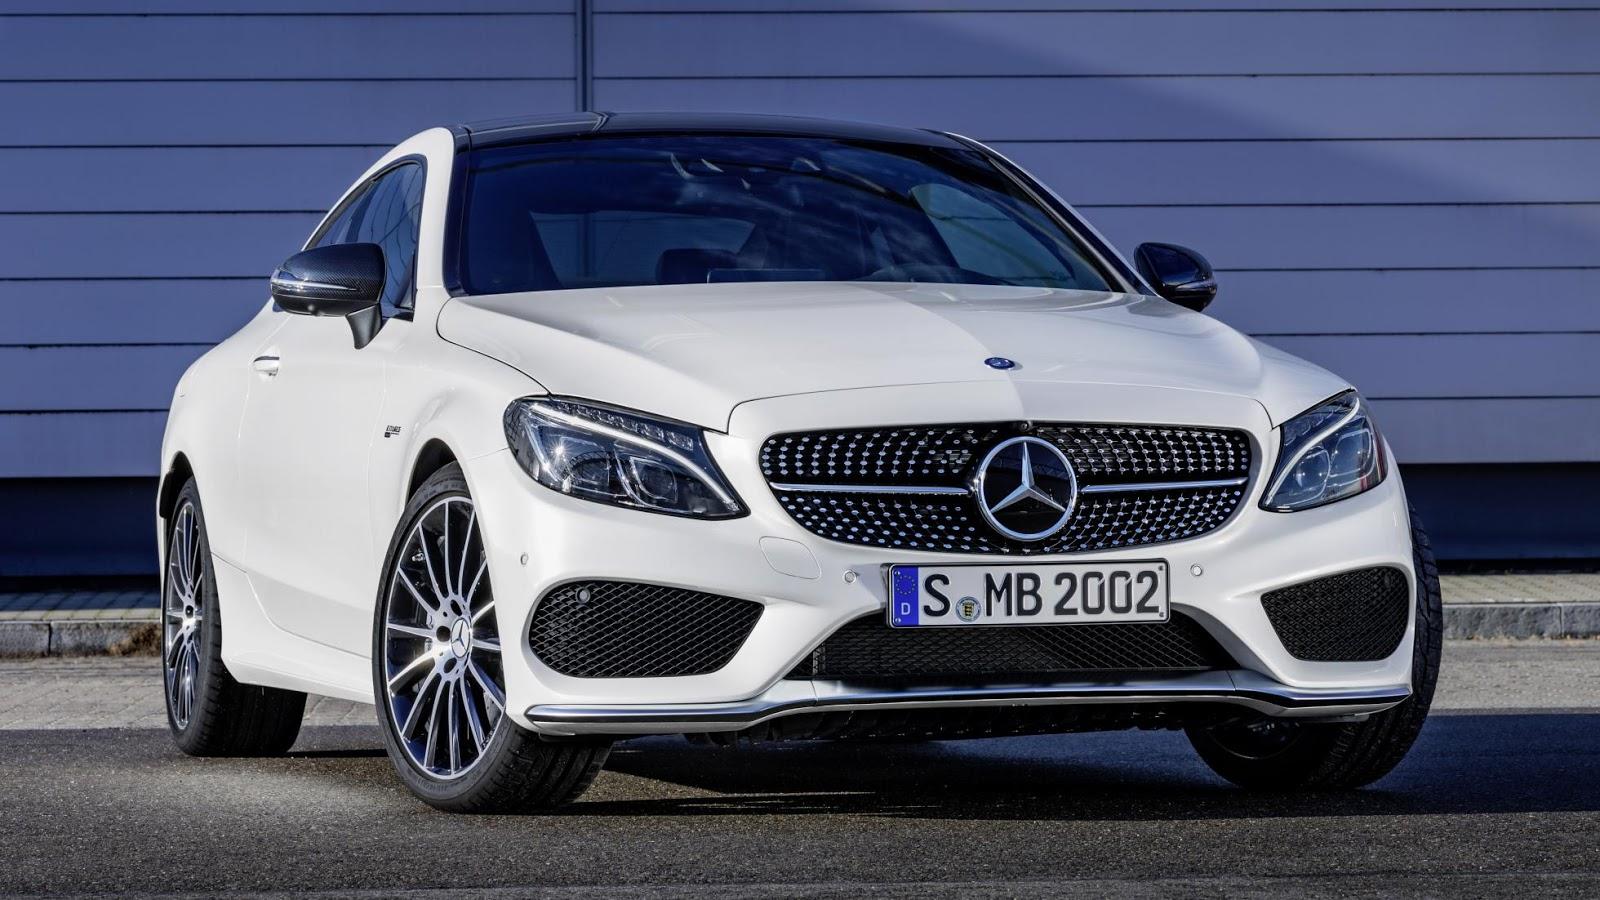 Đánh giá xe Mercedes AMG C43 Coupe 2017